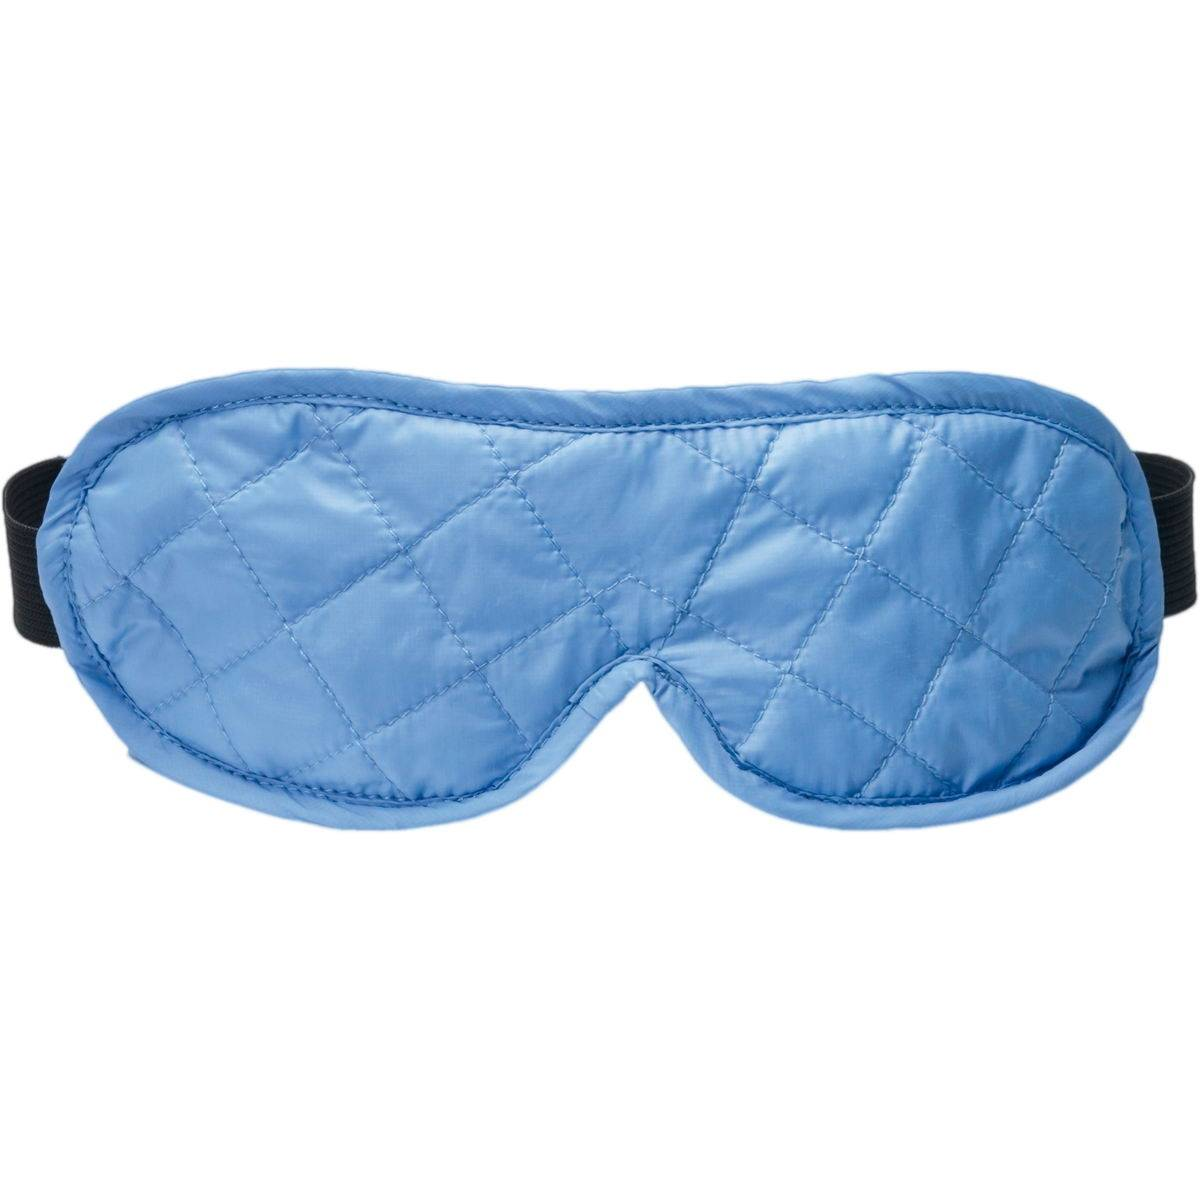 COCOON Eye Shade De Luxe - Schlaf-Brille light blue-grey